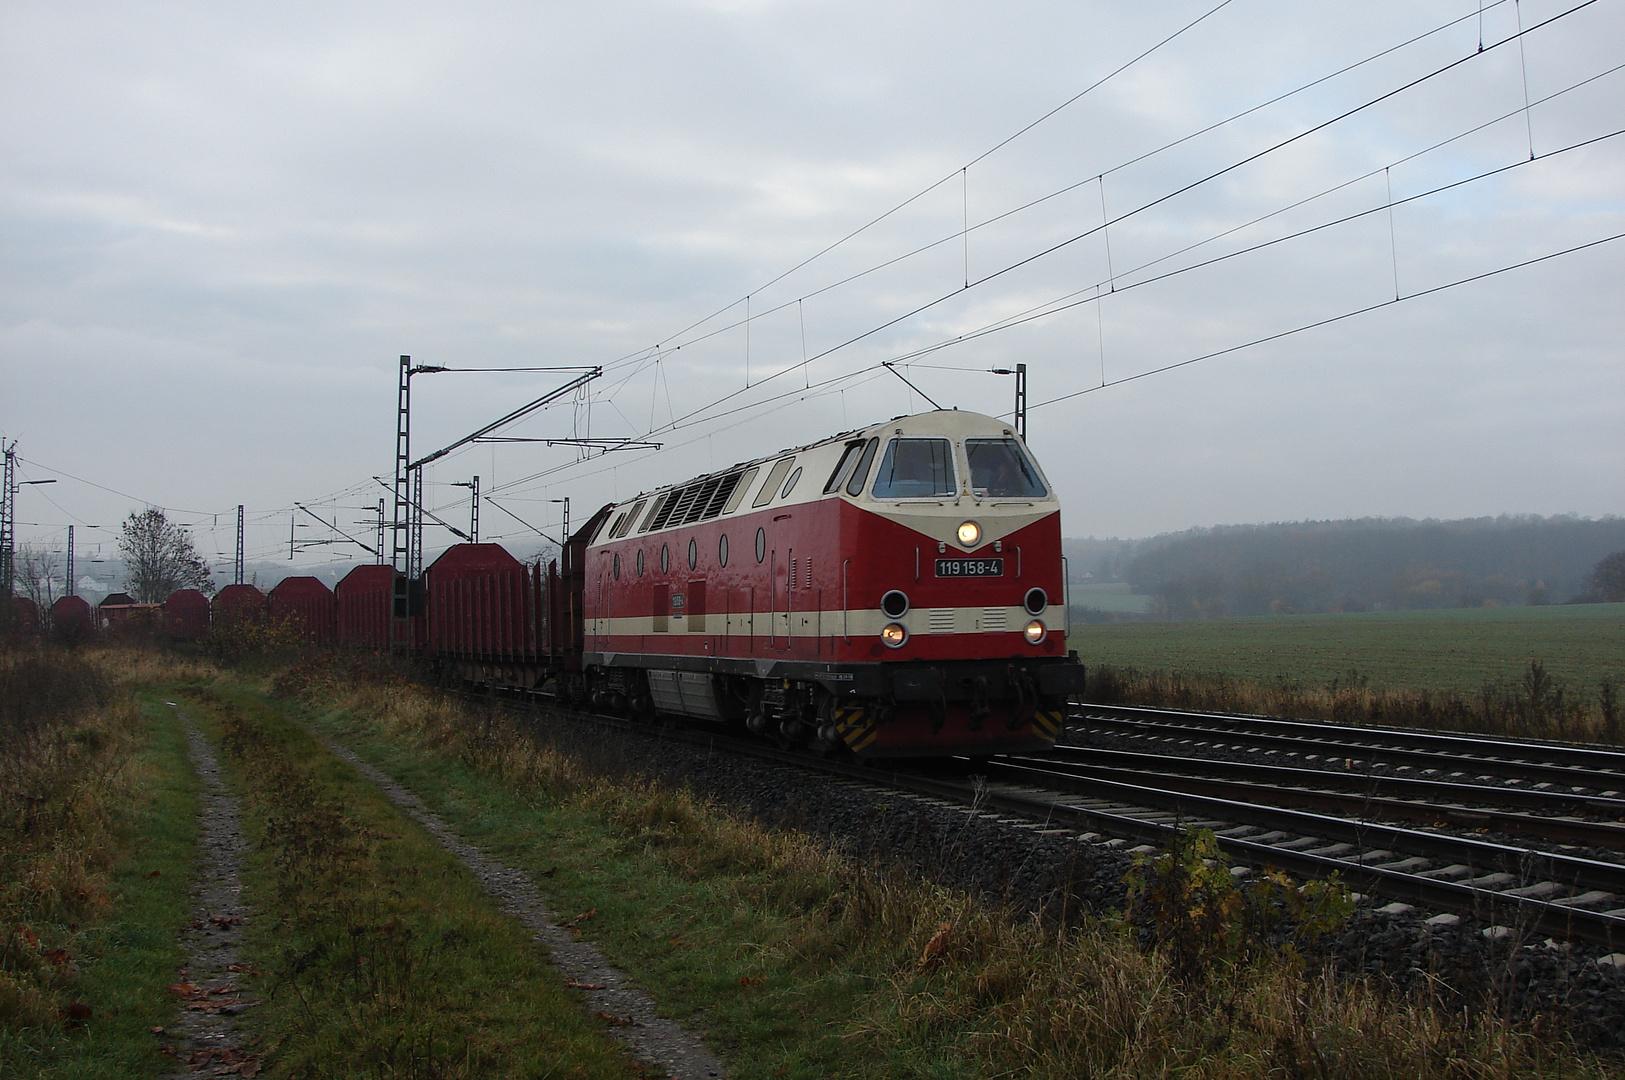 BR 119 158-4